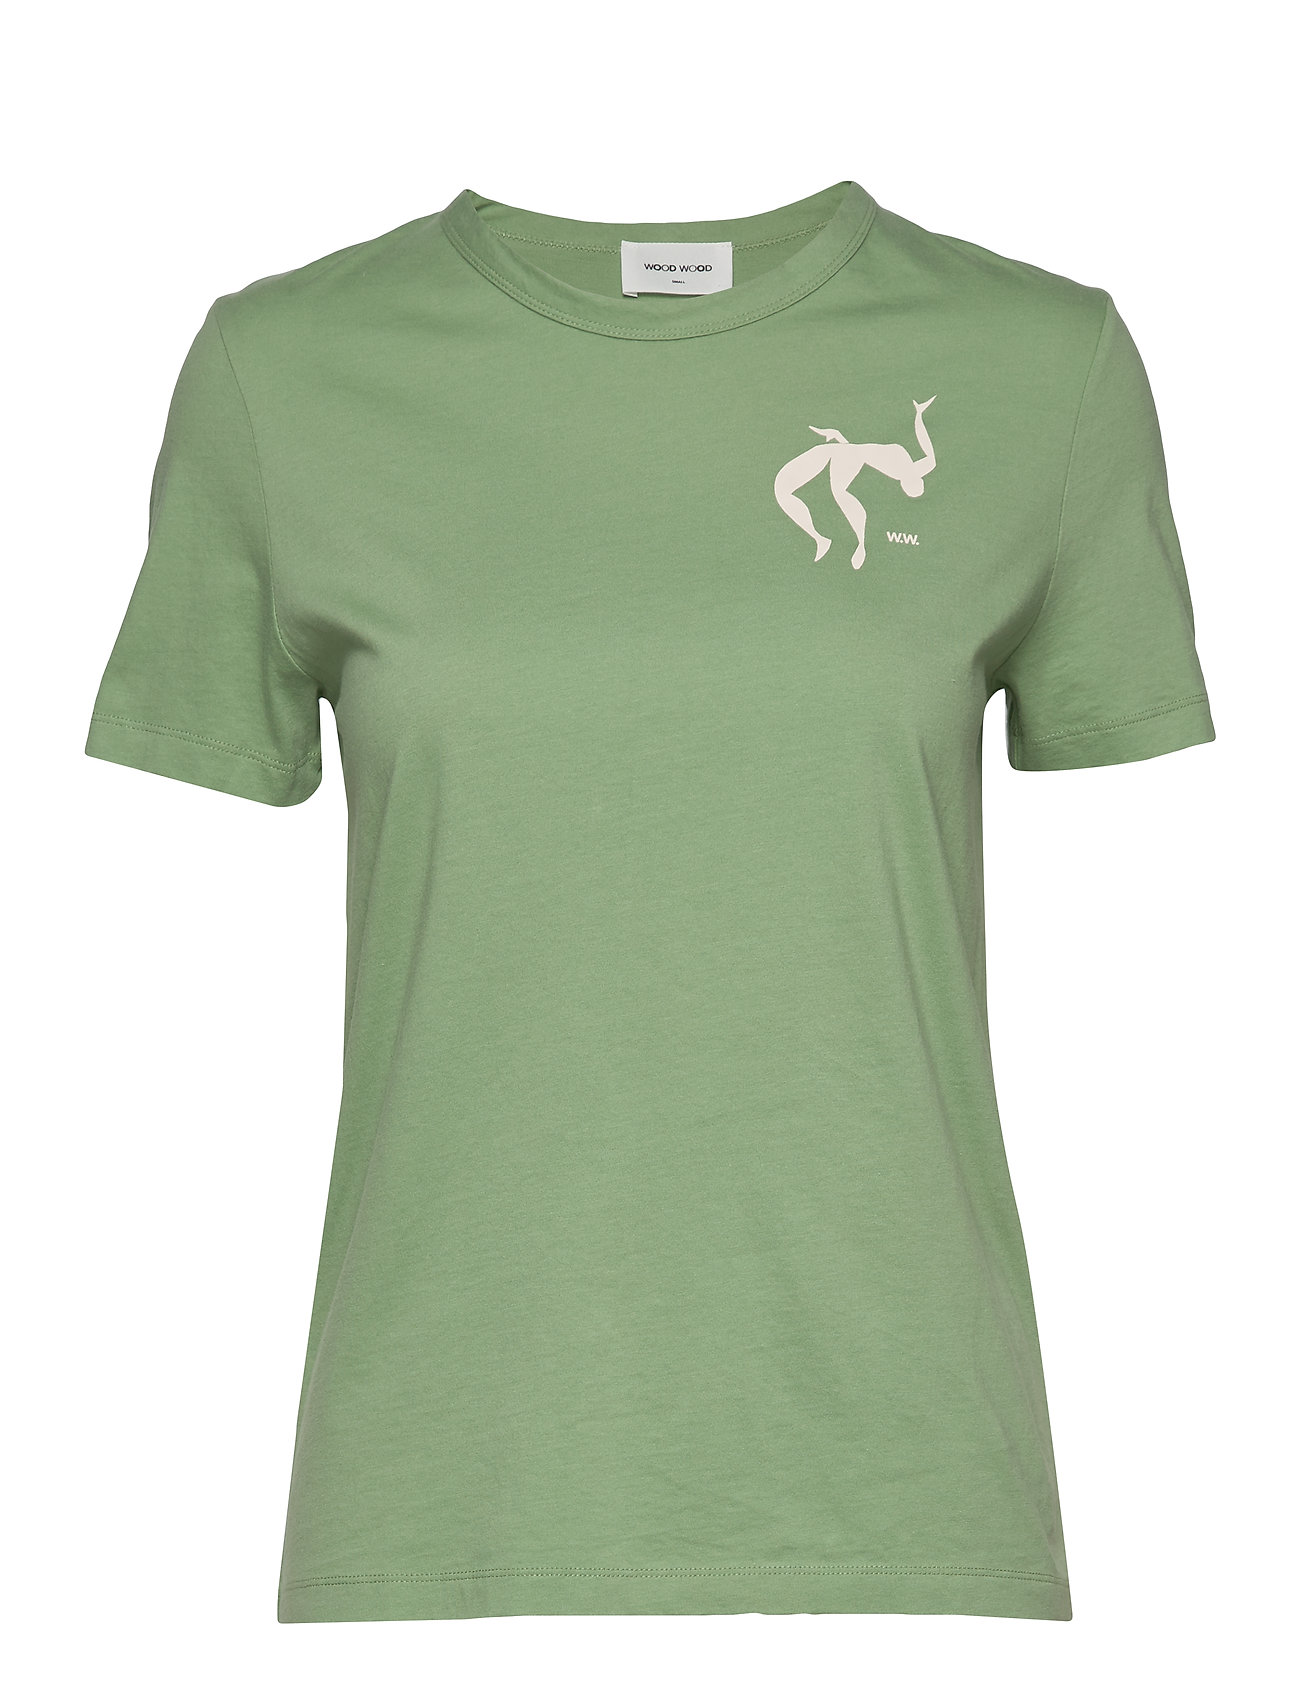 Wood Wood Aria T-shirt - DUSTY GREEN